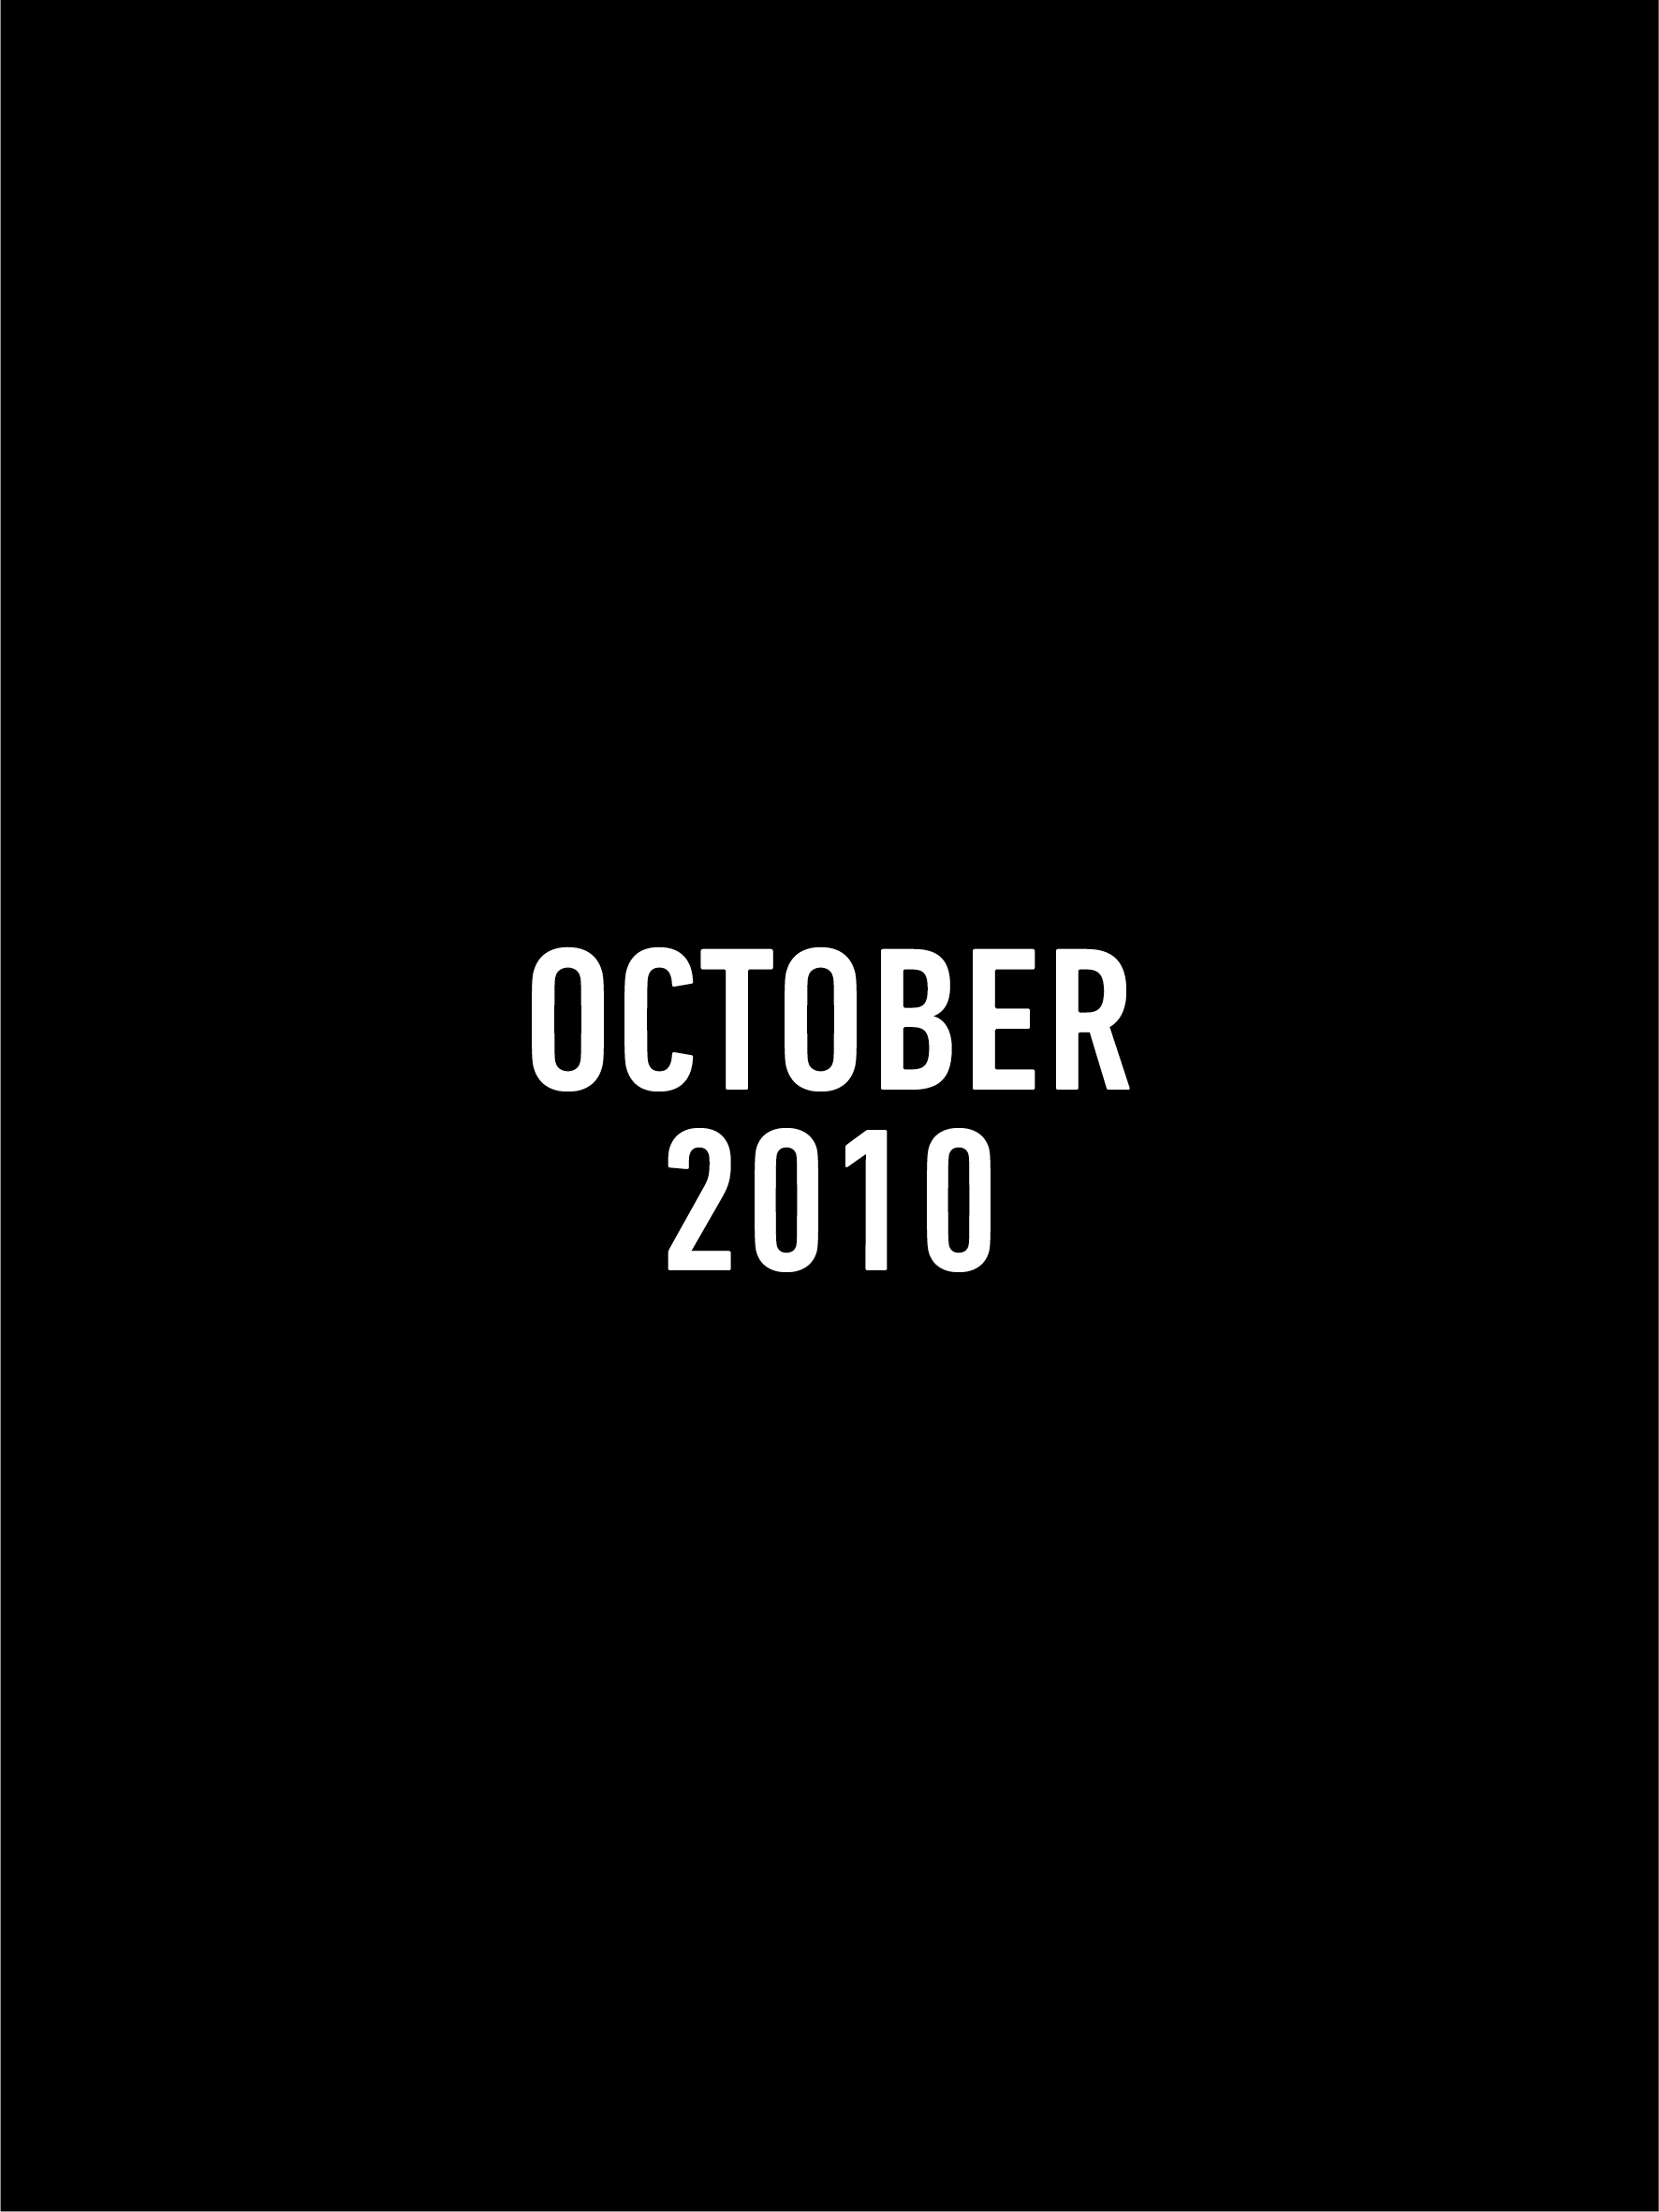 2010 monthly10.jpg